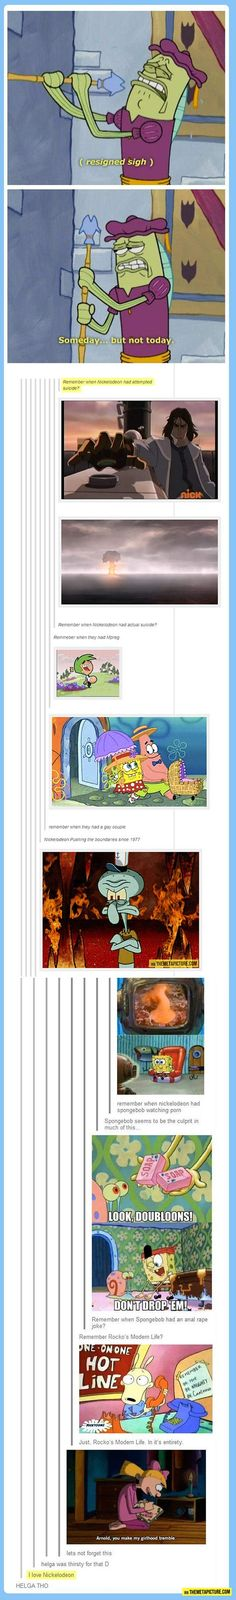 The dark side of Nickelodeon